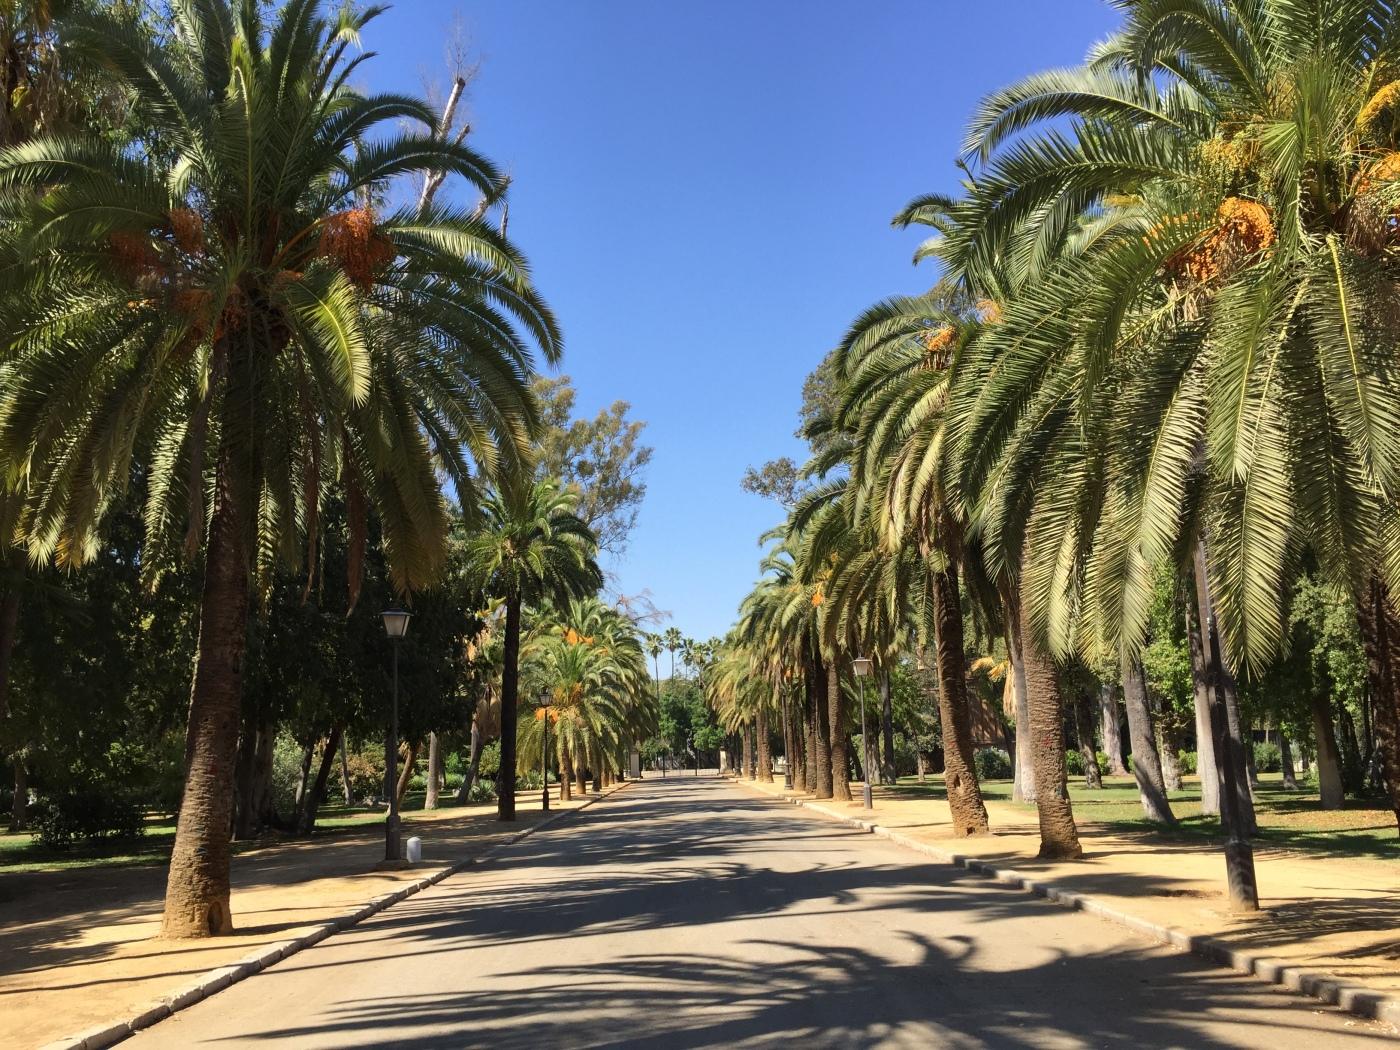 PHOTO 2 Seville Spain